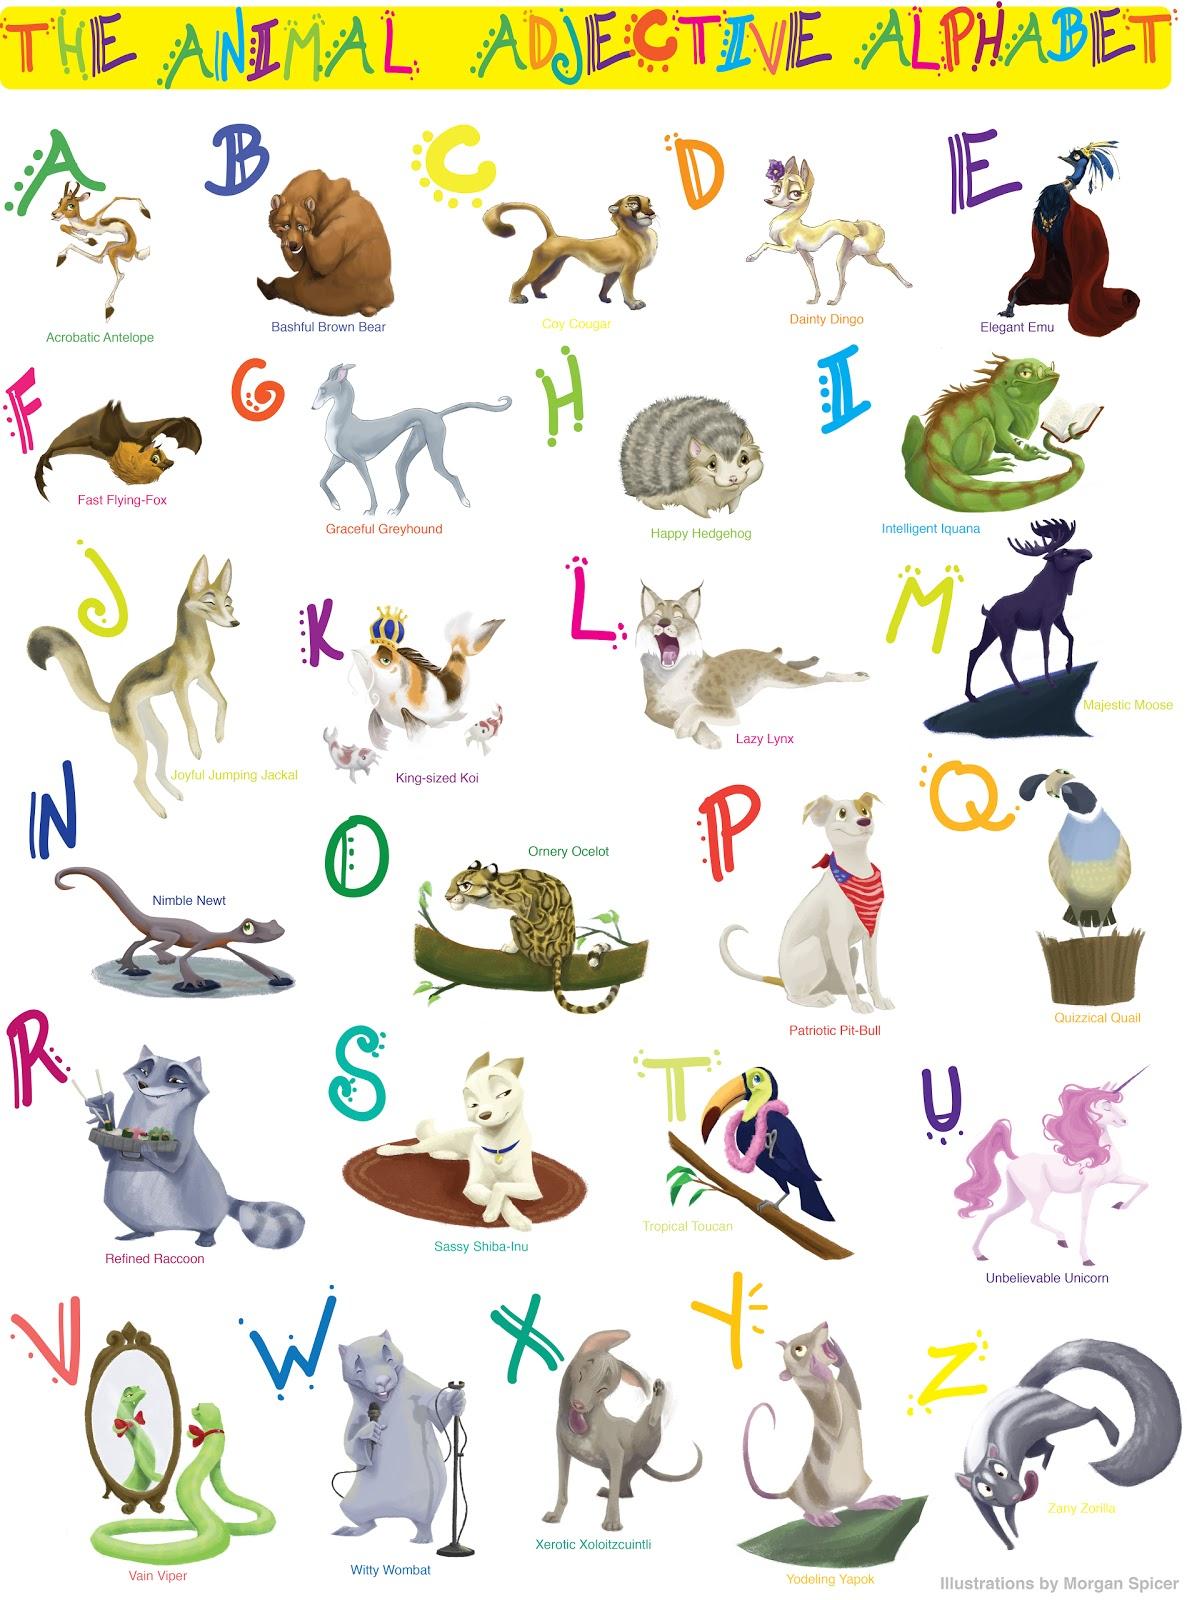 Morgan Spicer Illustration The Animal Adjective Alphabet